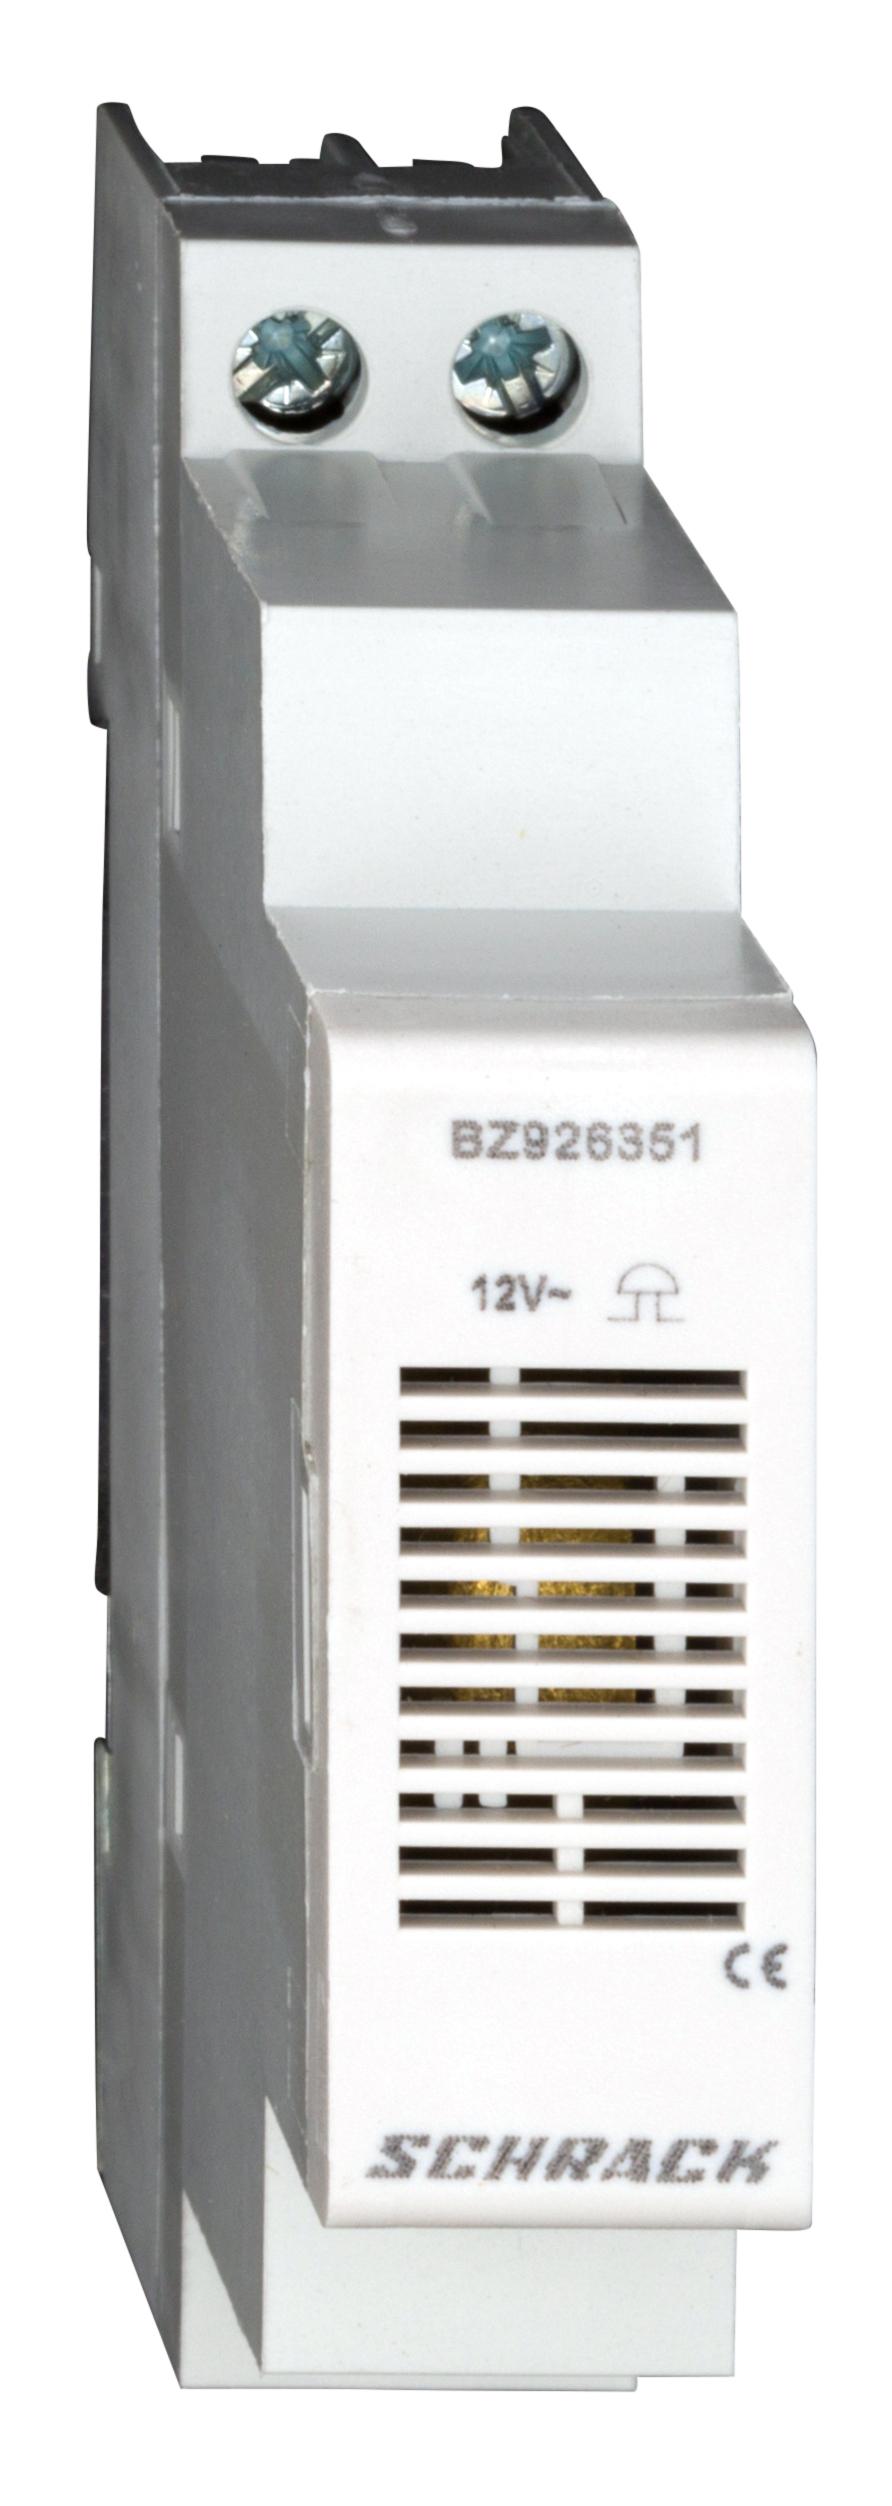 1 Stk Reiheneinbau Klingel 1TE 12V BZ926351--